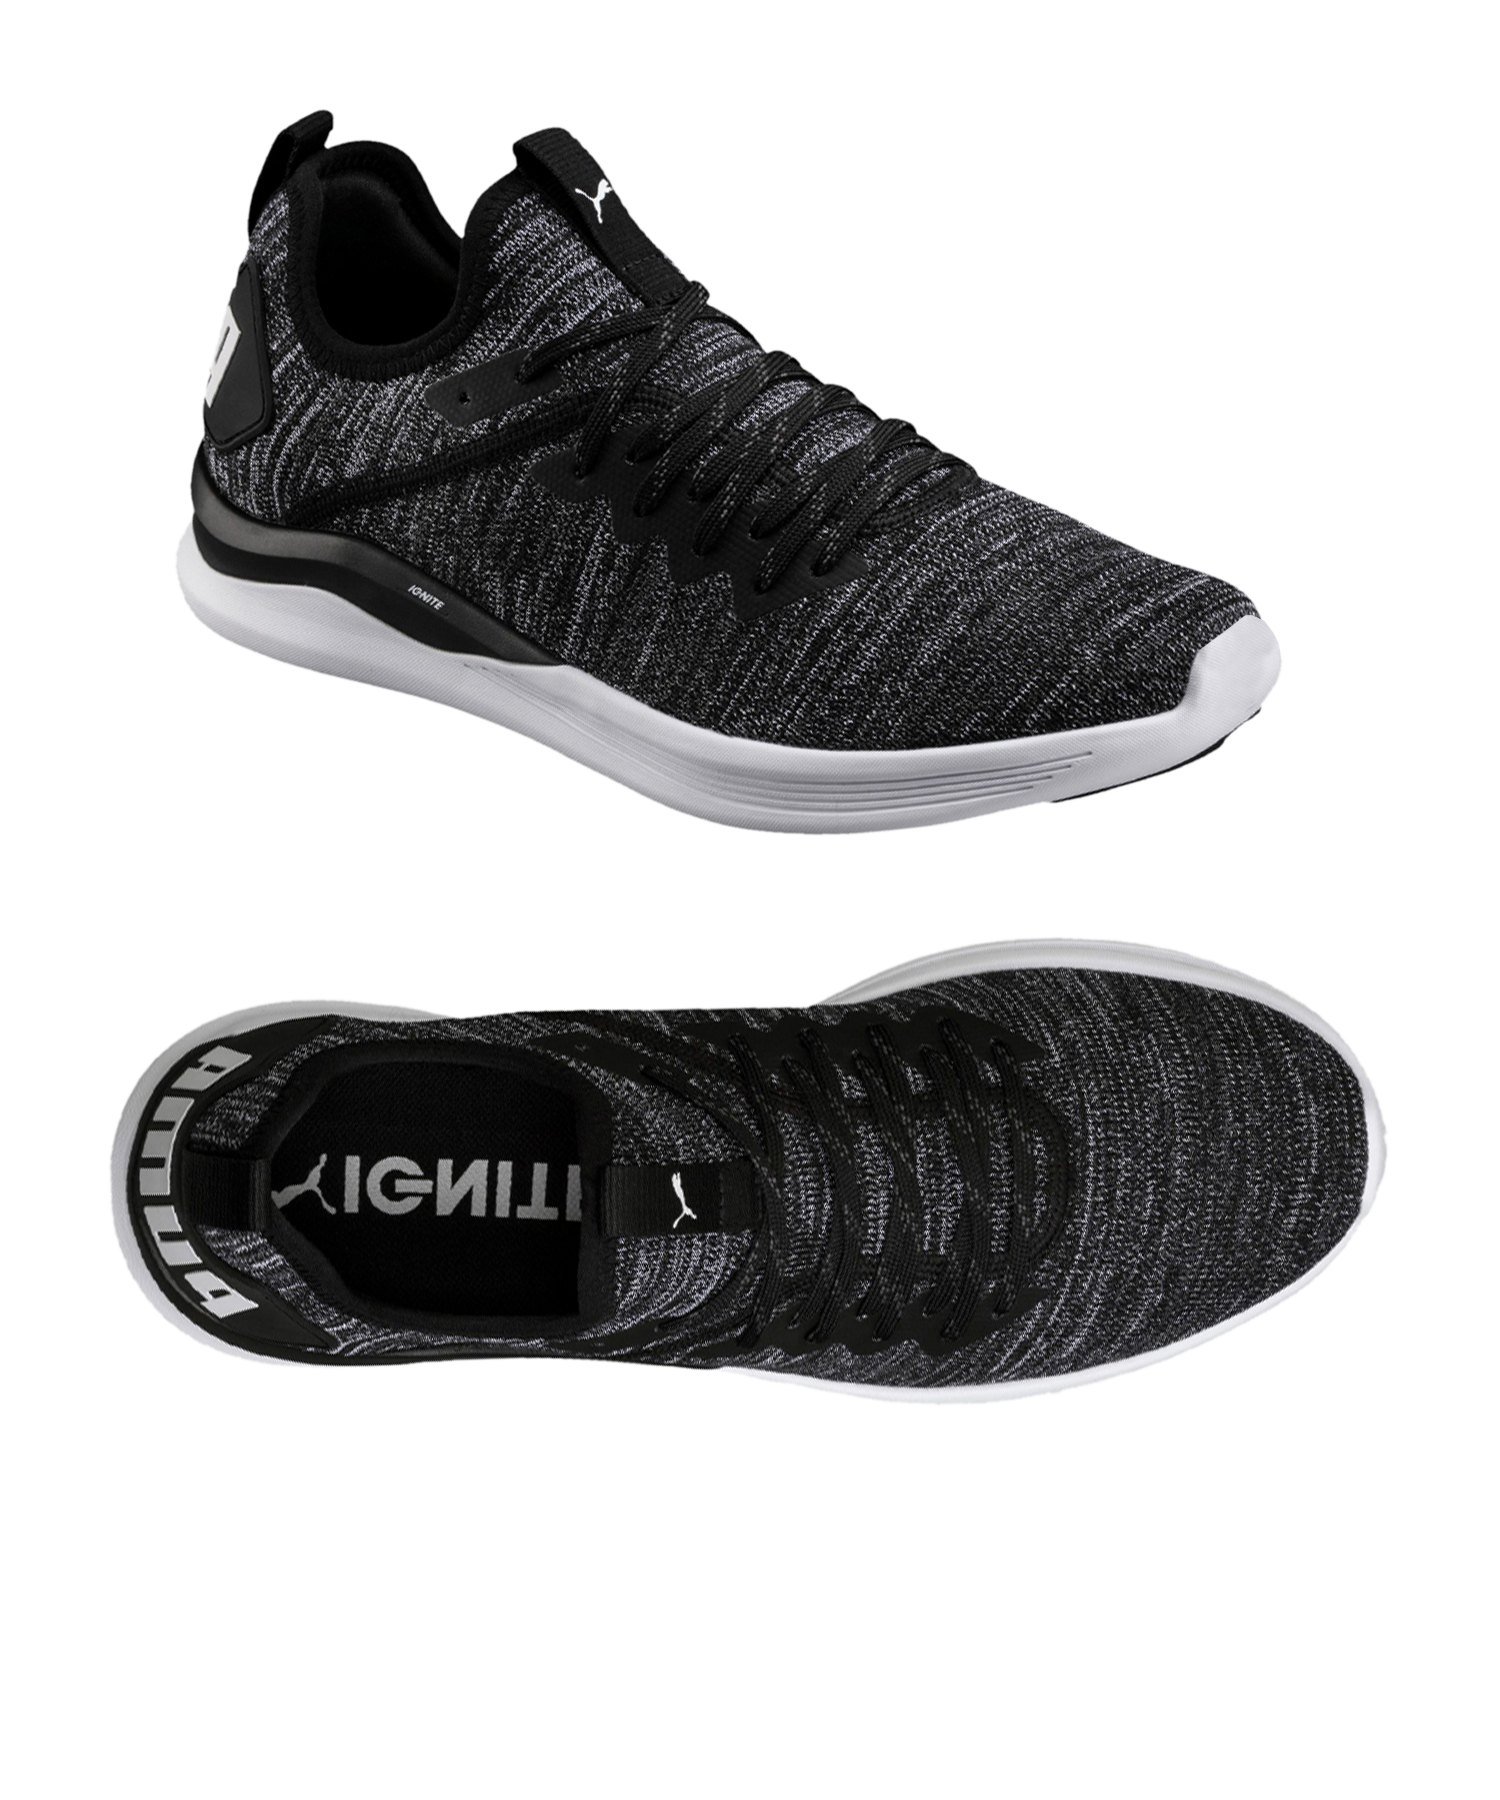 PUMA Ignite Flash evoKNIT Sneaker Schwarz F02